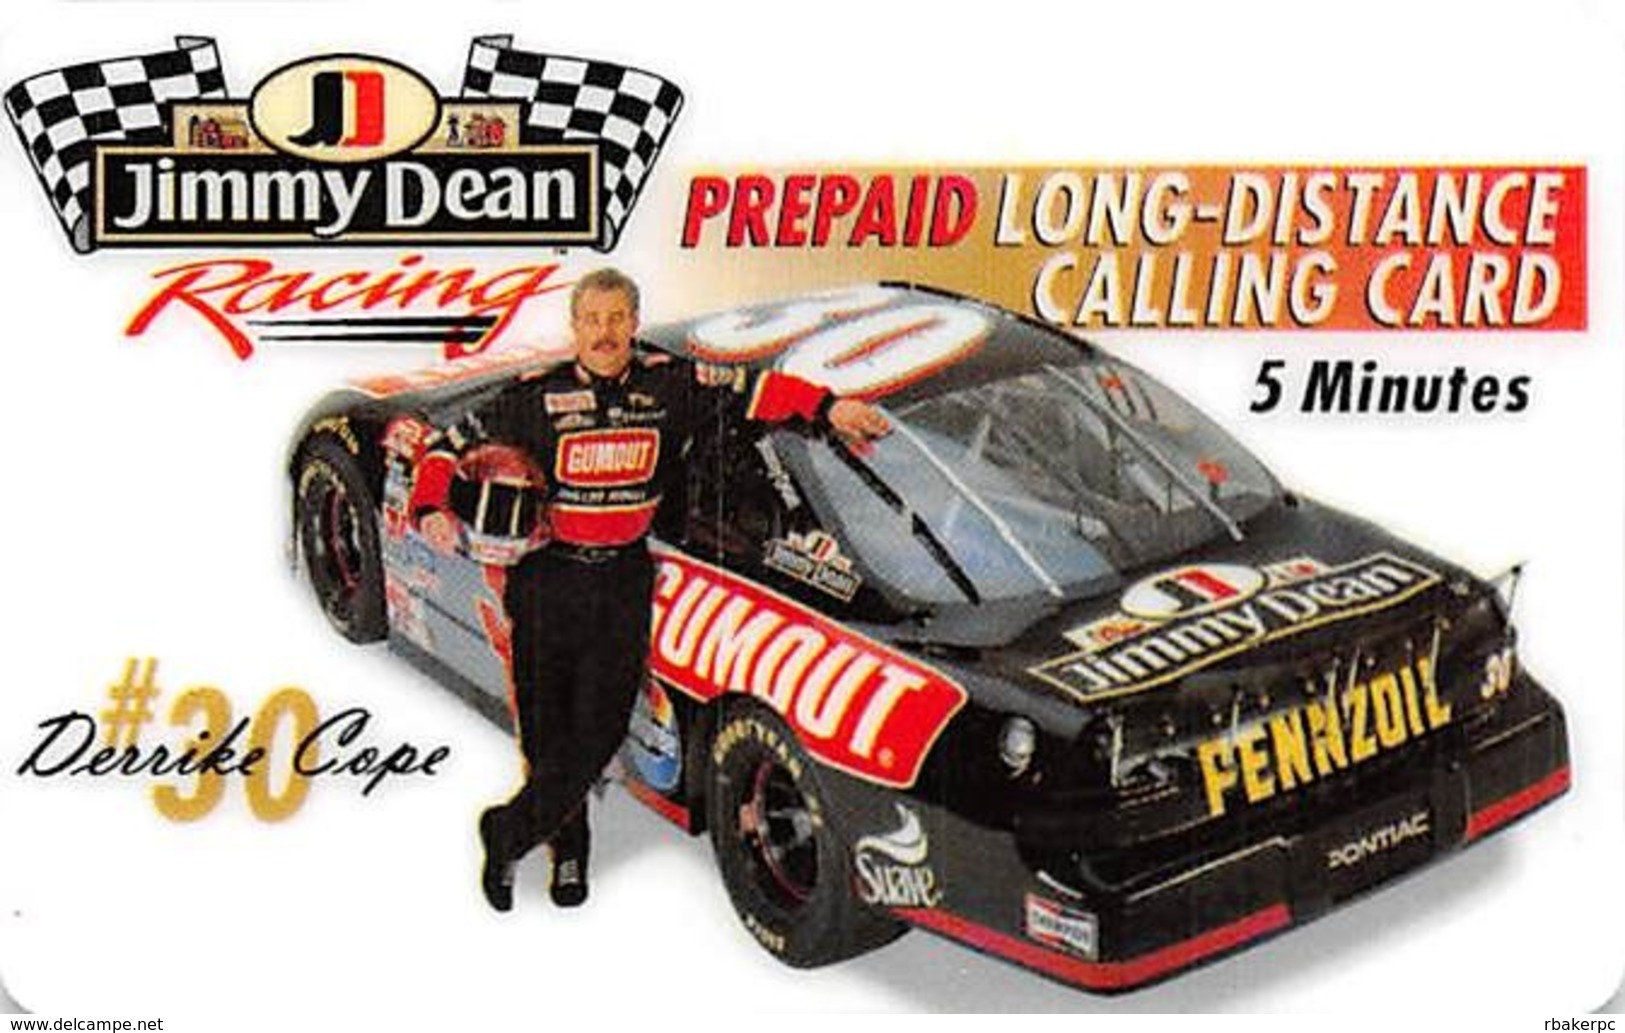 Jimmy Dean Racing Prepaid Long-Distance Calling Card - Cars